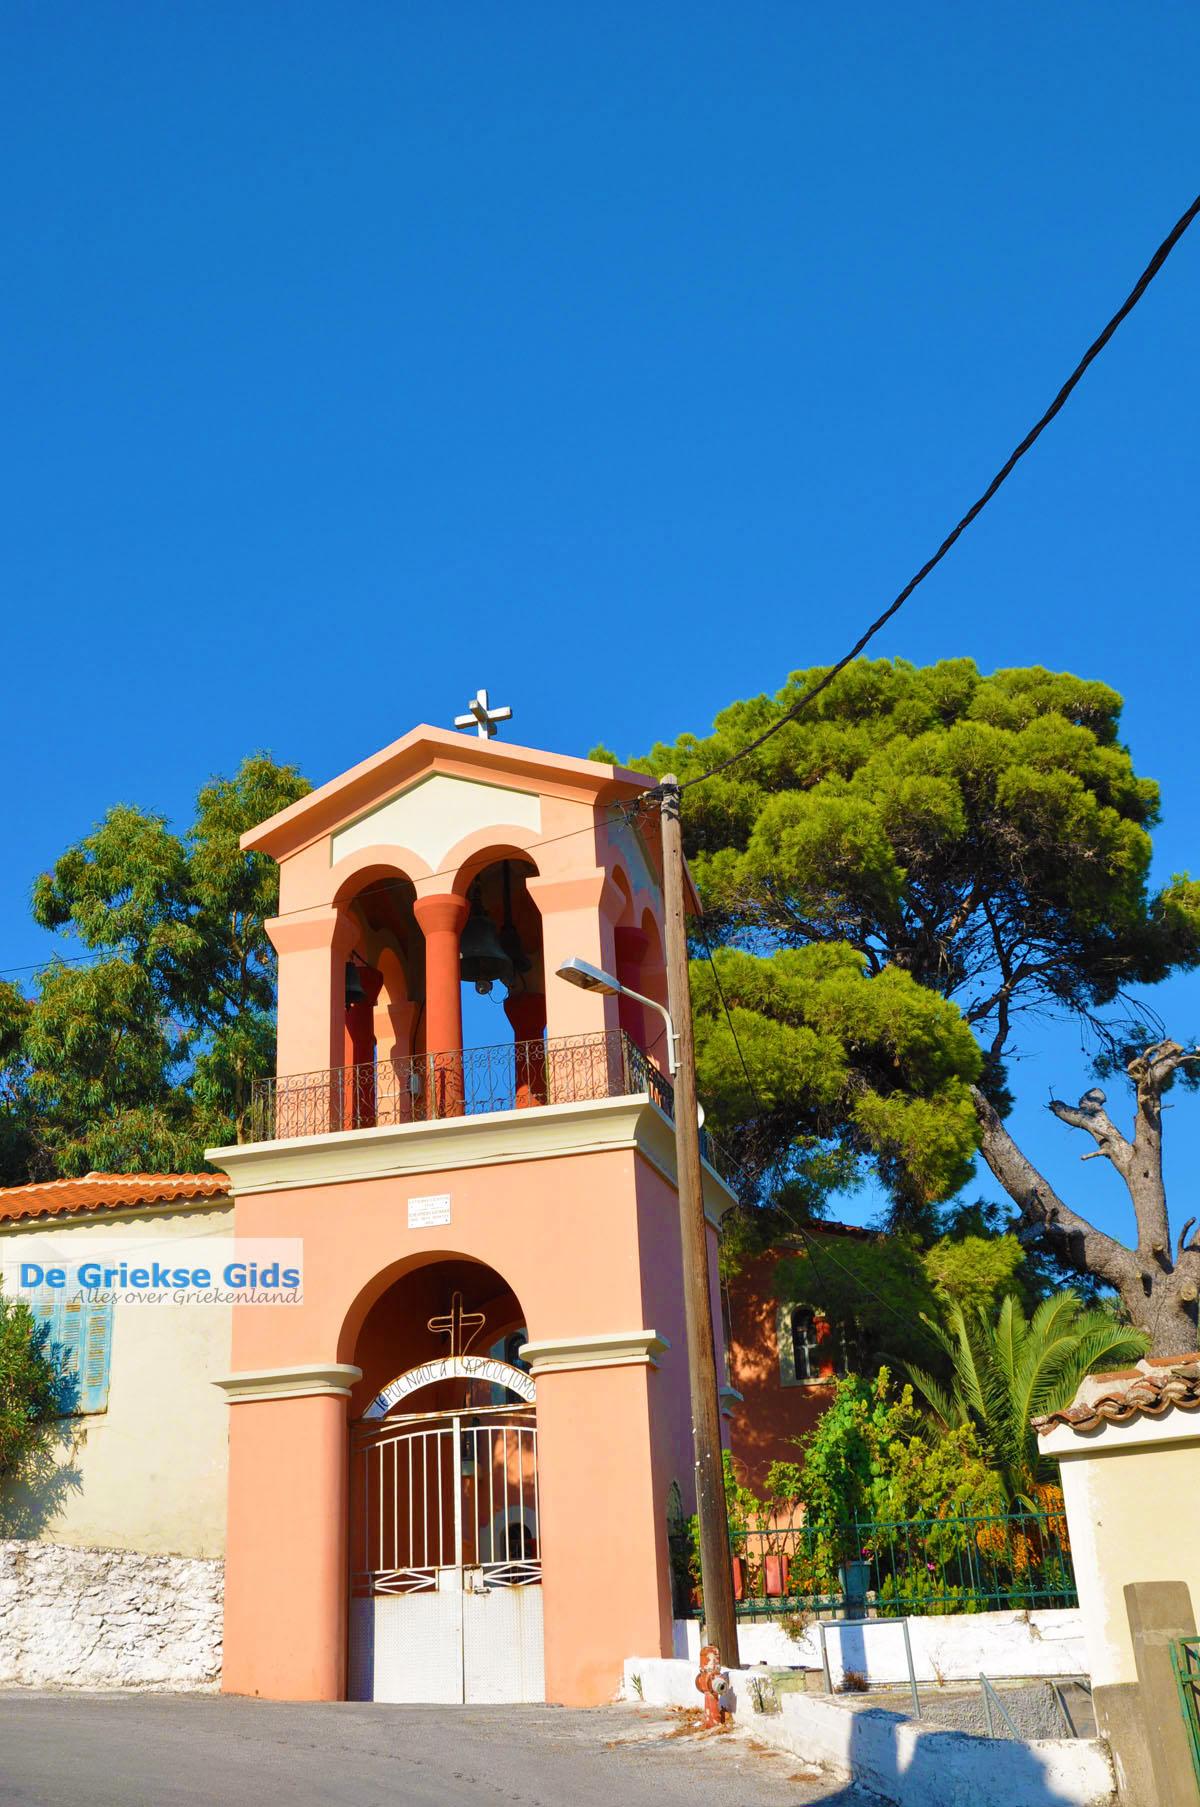 foto Plomari   Lesbos Griekenland   De Griekse Gids 65